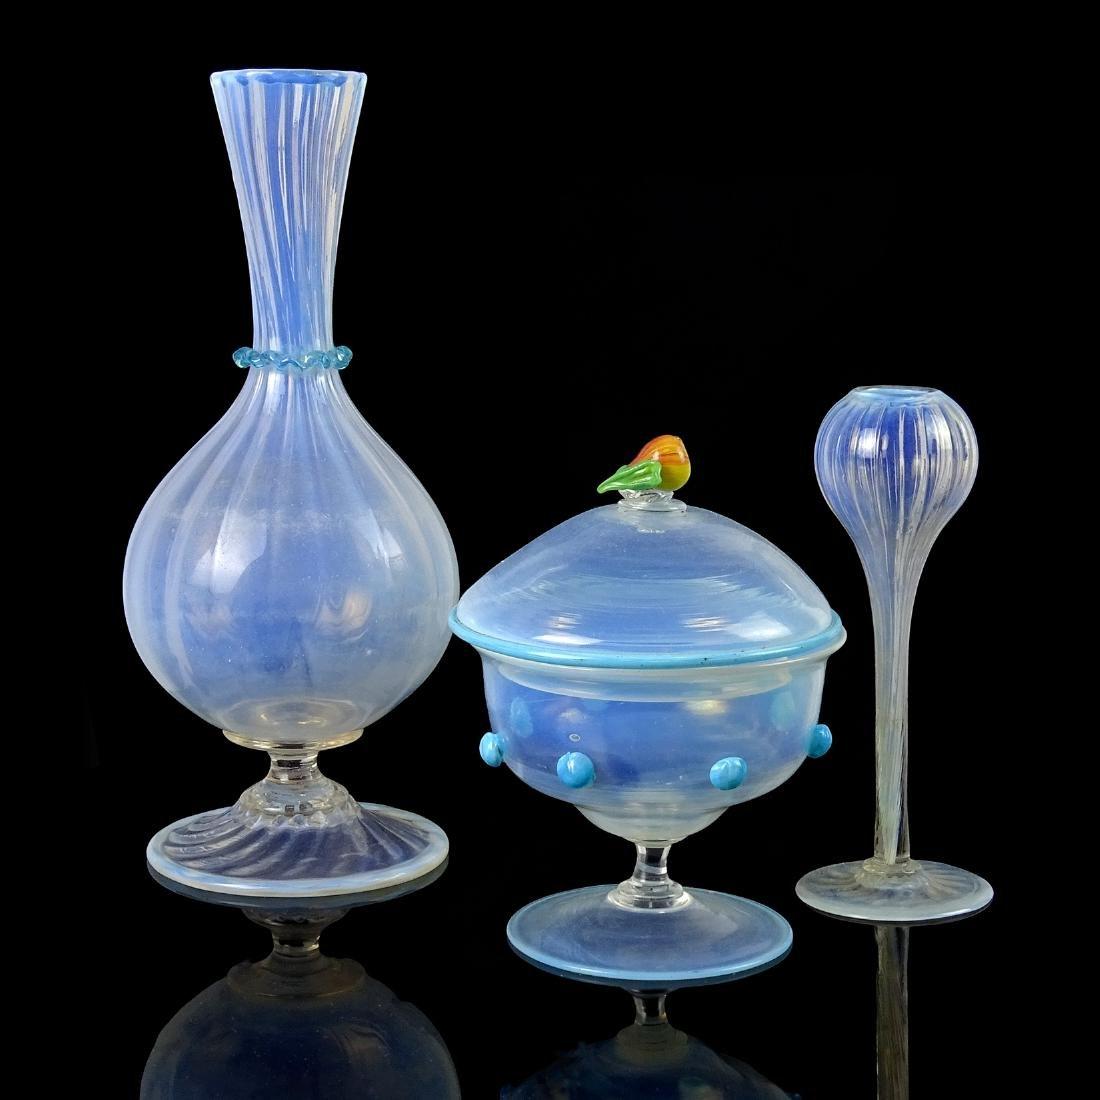 Salviati Venetian Opal Blue Art Glass Vases and Jar